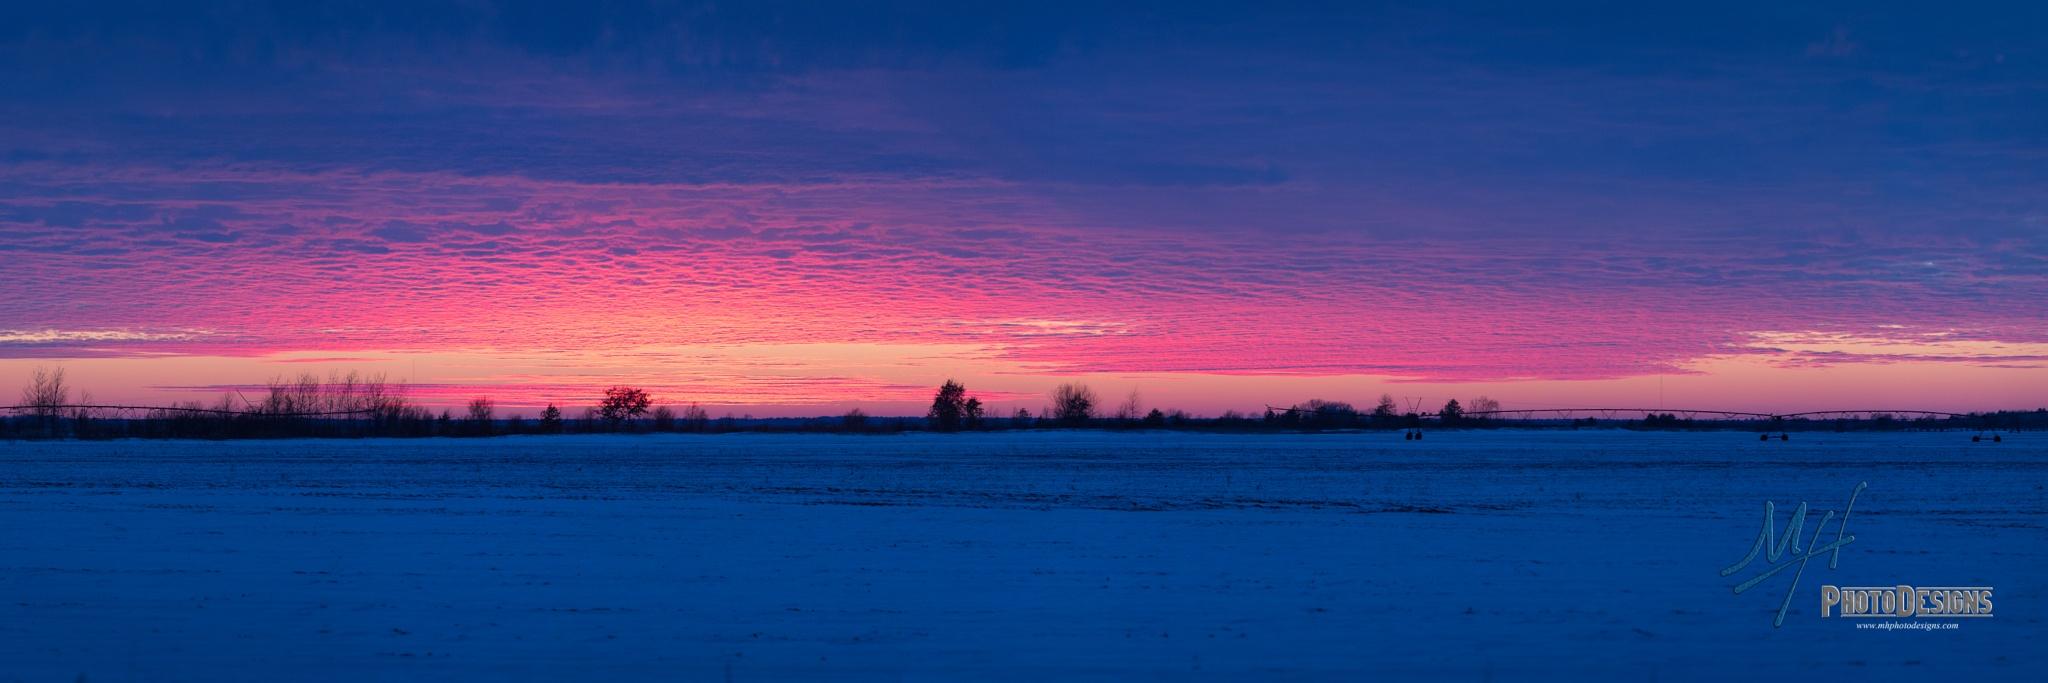 """Sunset"" by Marcus Hammitt"